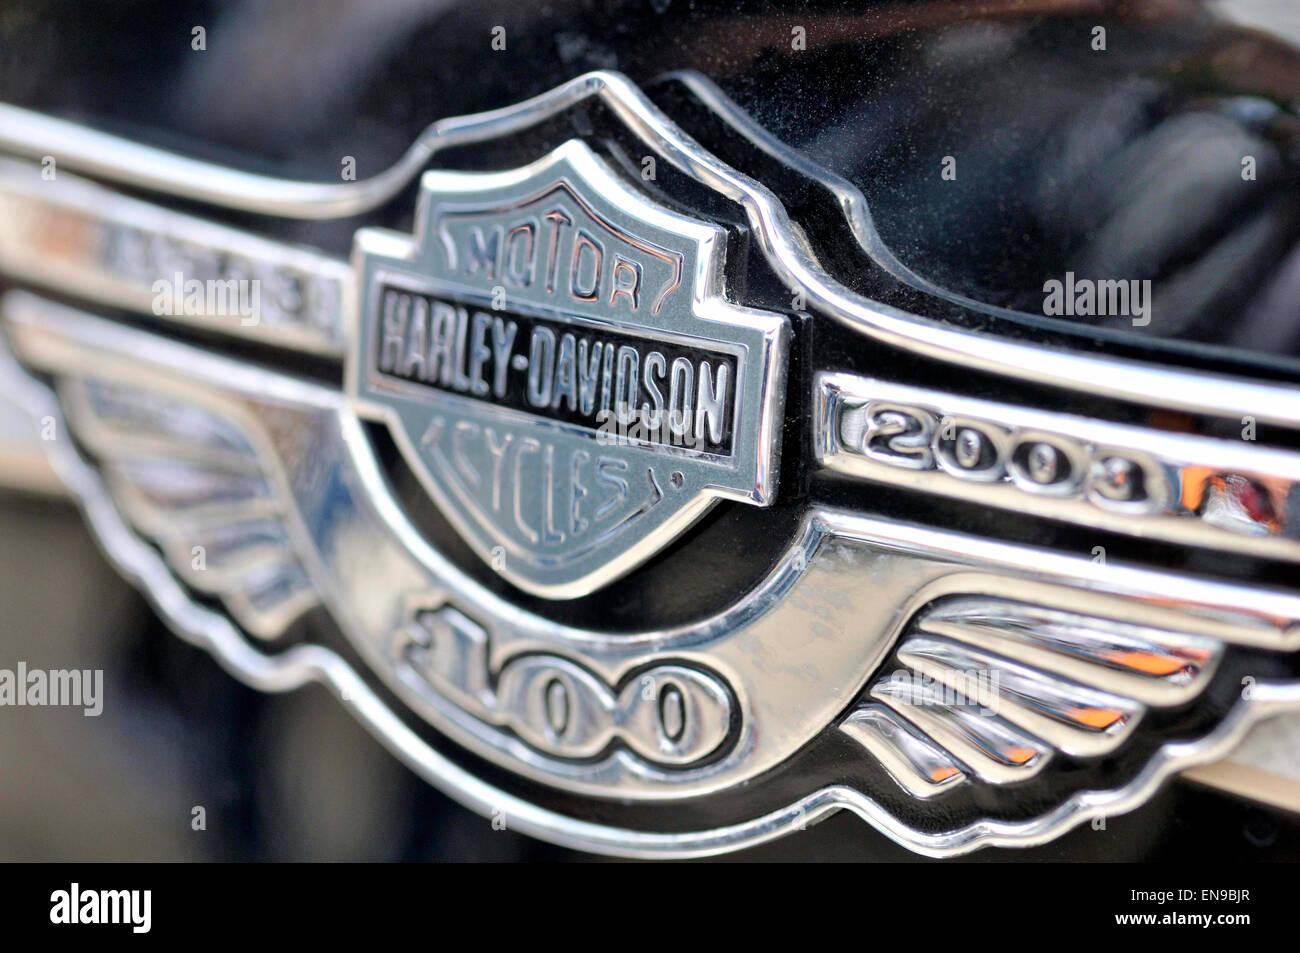 Harley davidson motorcycle logo detail stock photo 81955967 alamy harley davidson motorcycle logo detail voltagebd Gallery